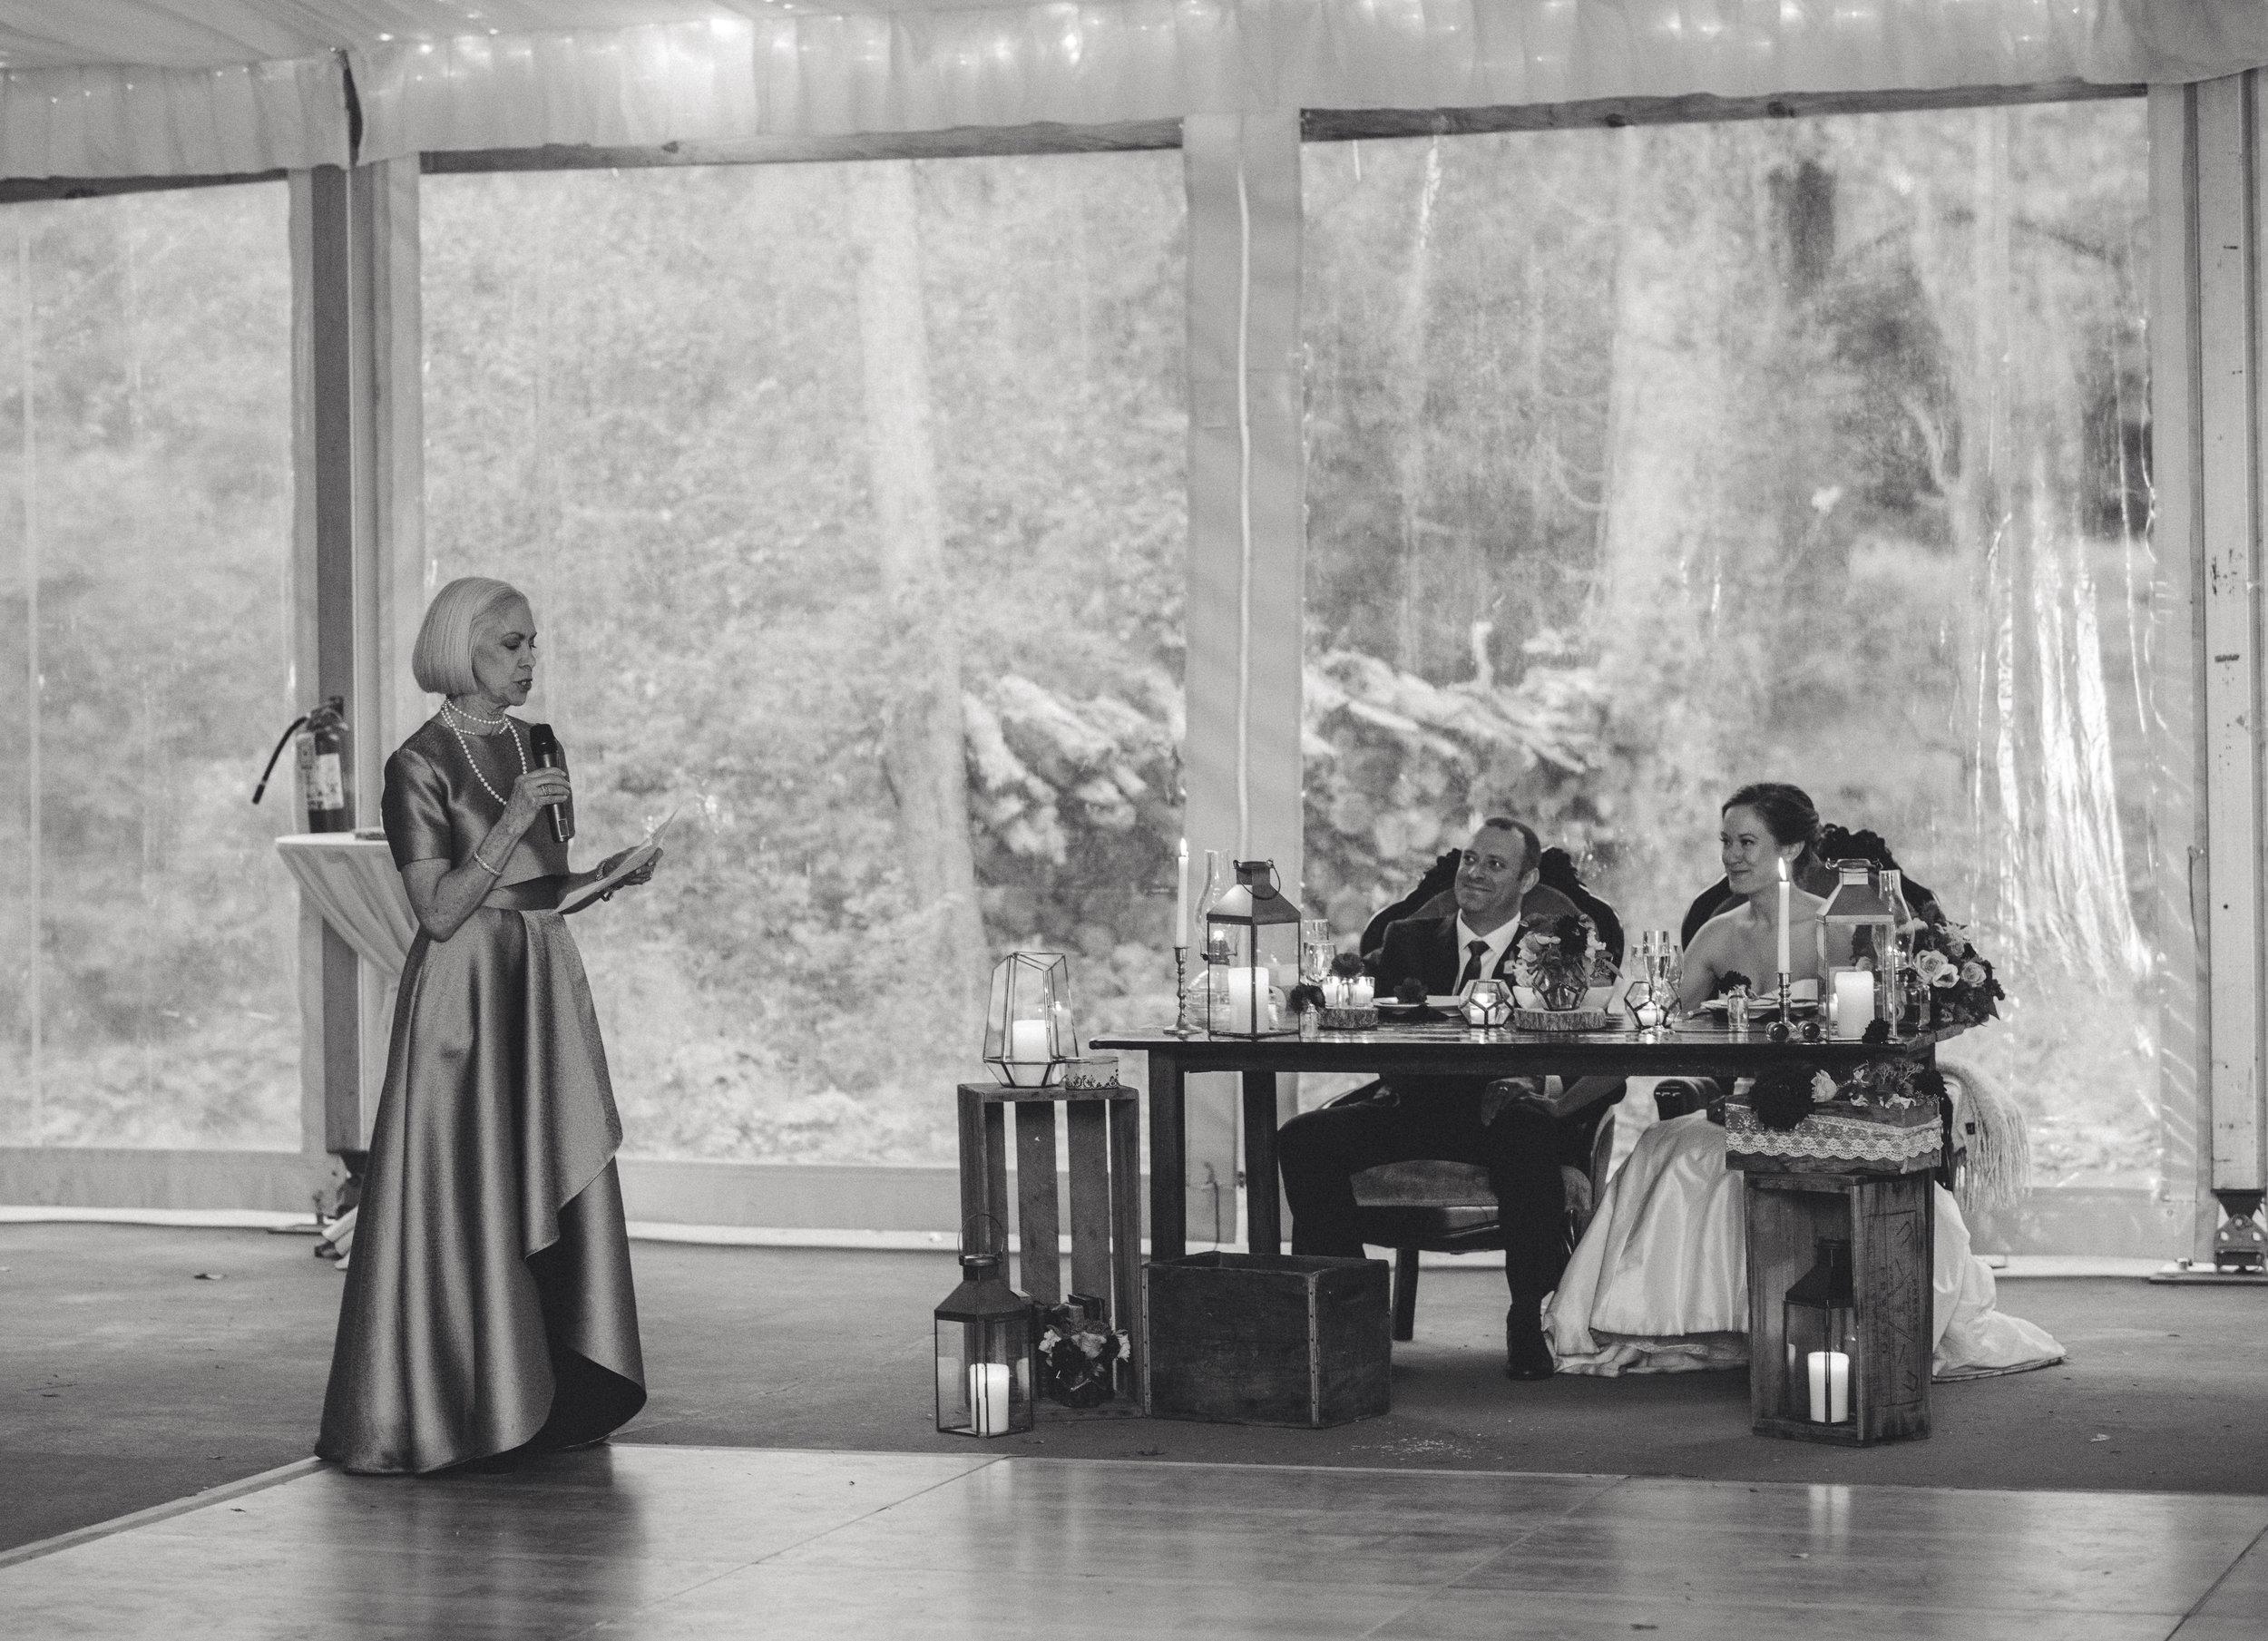 JACQUELINE & ANDREW WARSHAWER -BROOKMILL FARM FALL WEDDING - INTIMATE WEDDING PHOTOGRAPHER - TWOTWENTY by CHI-CHI AGBIM-497.jpg